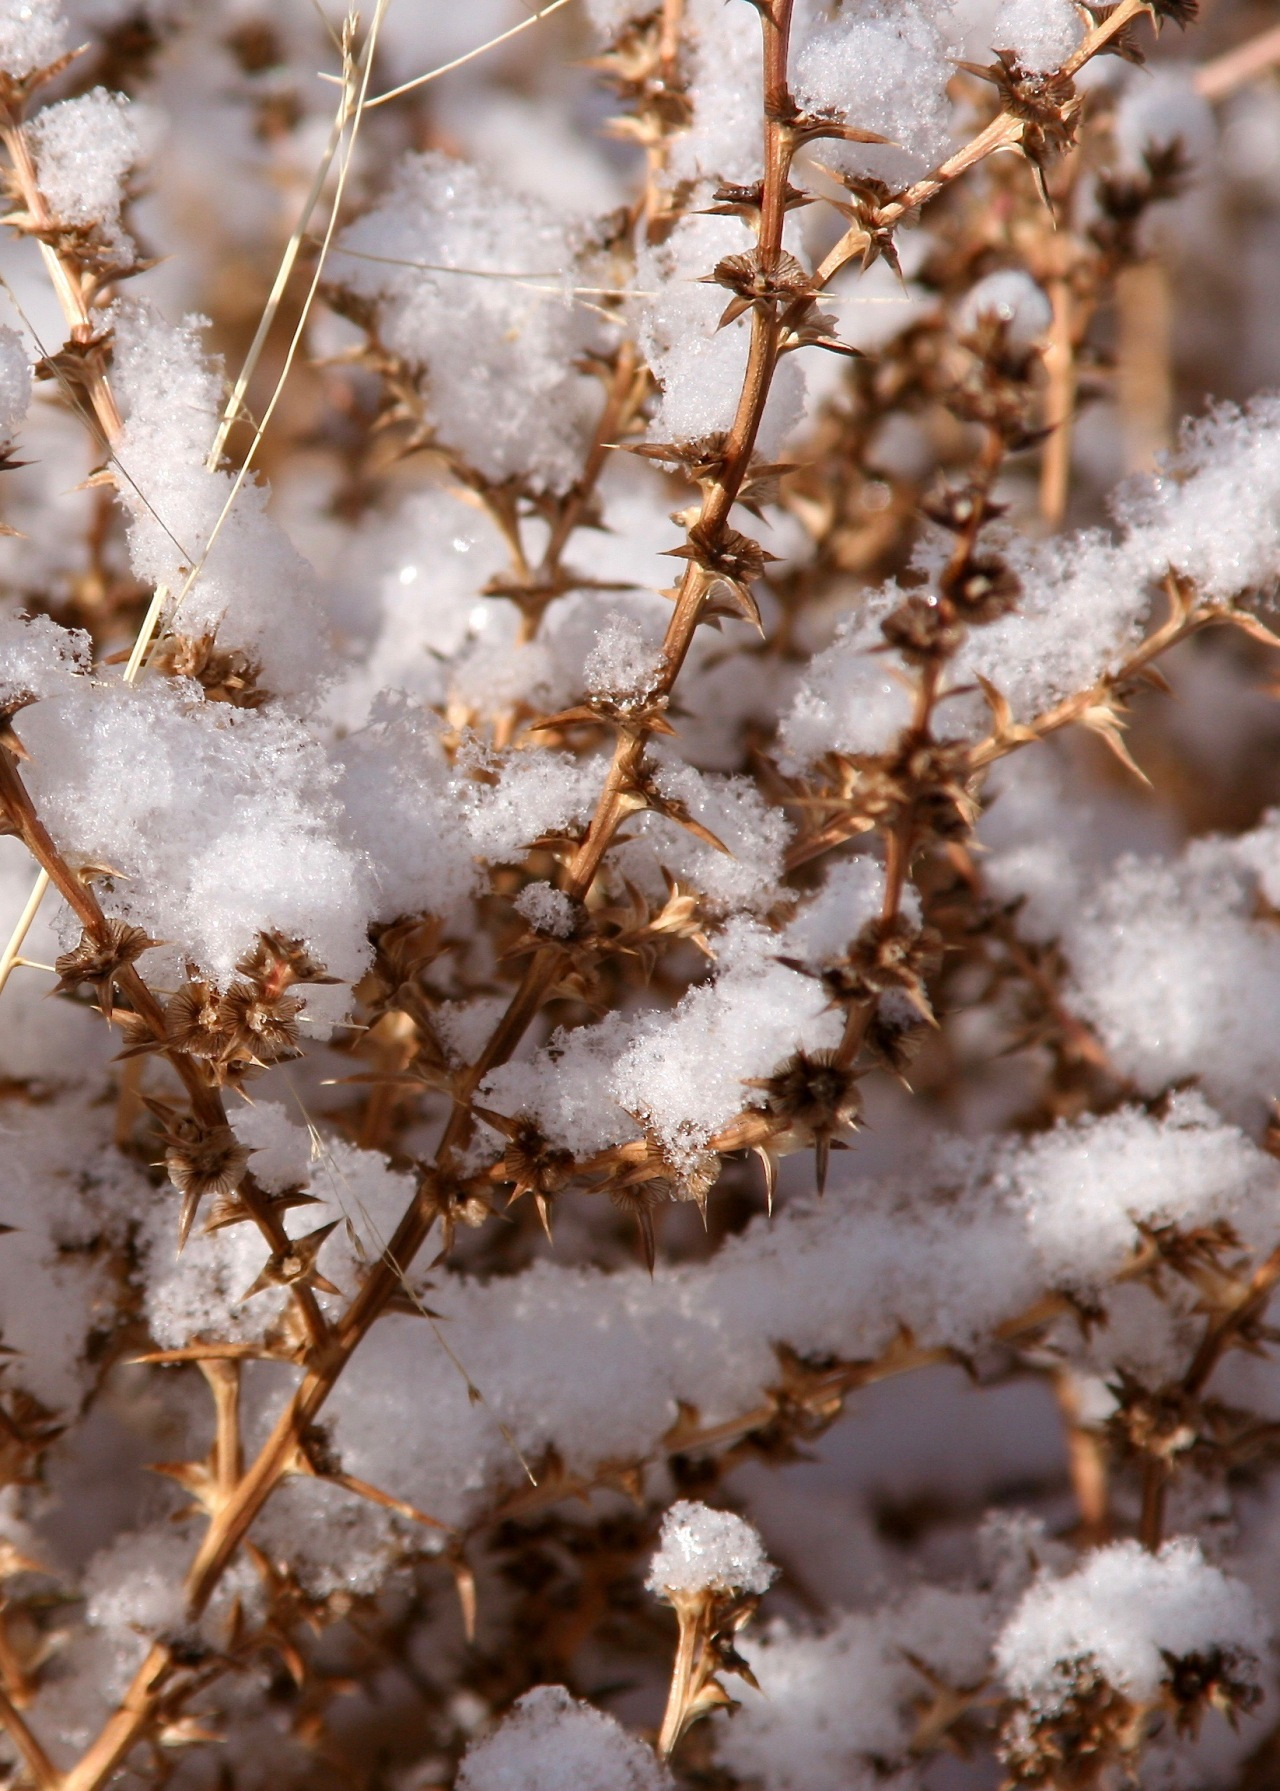 Snow Tumbleweed Balmorhea SP TX 11-2006